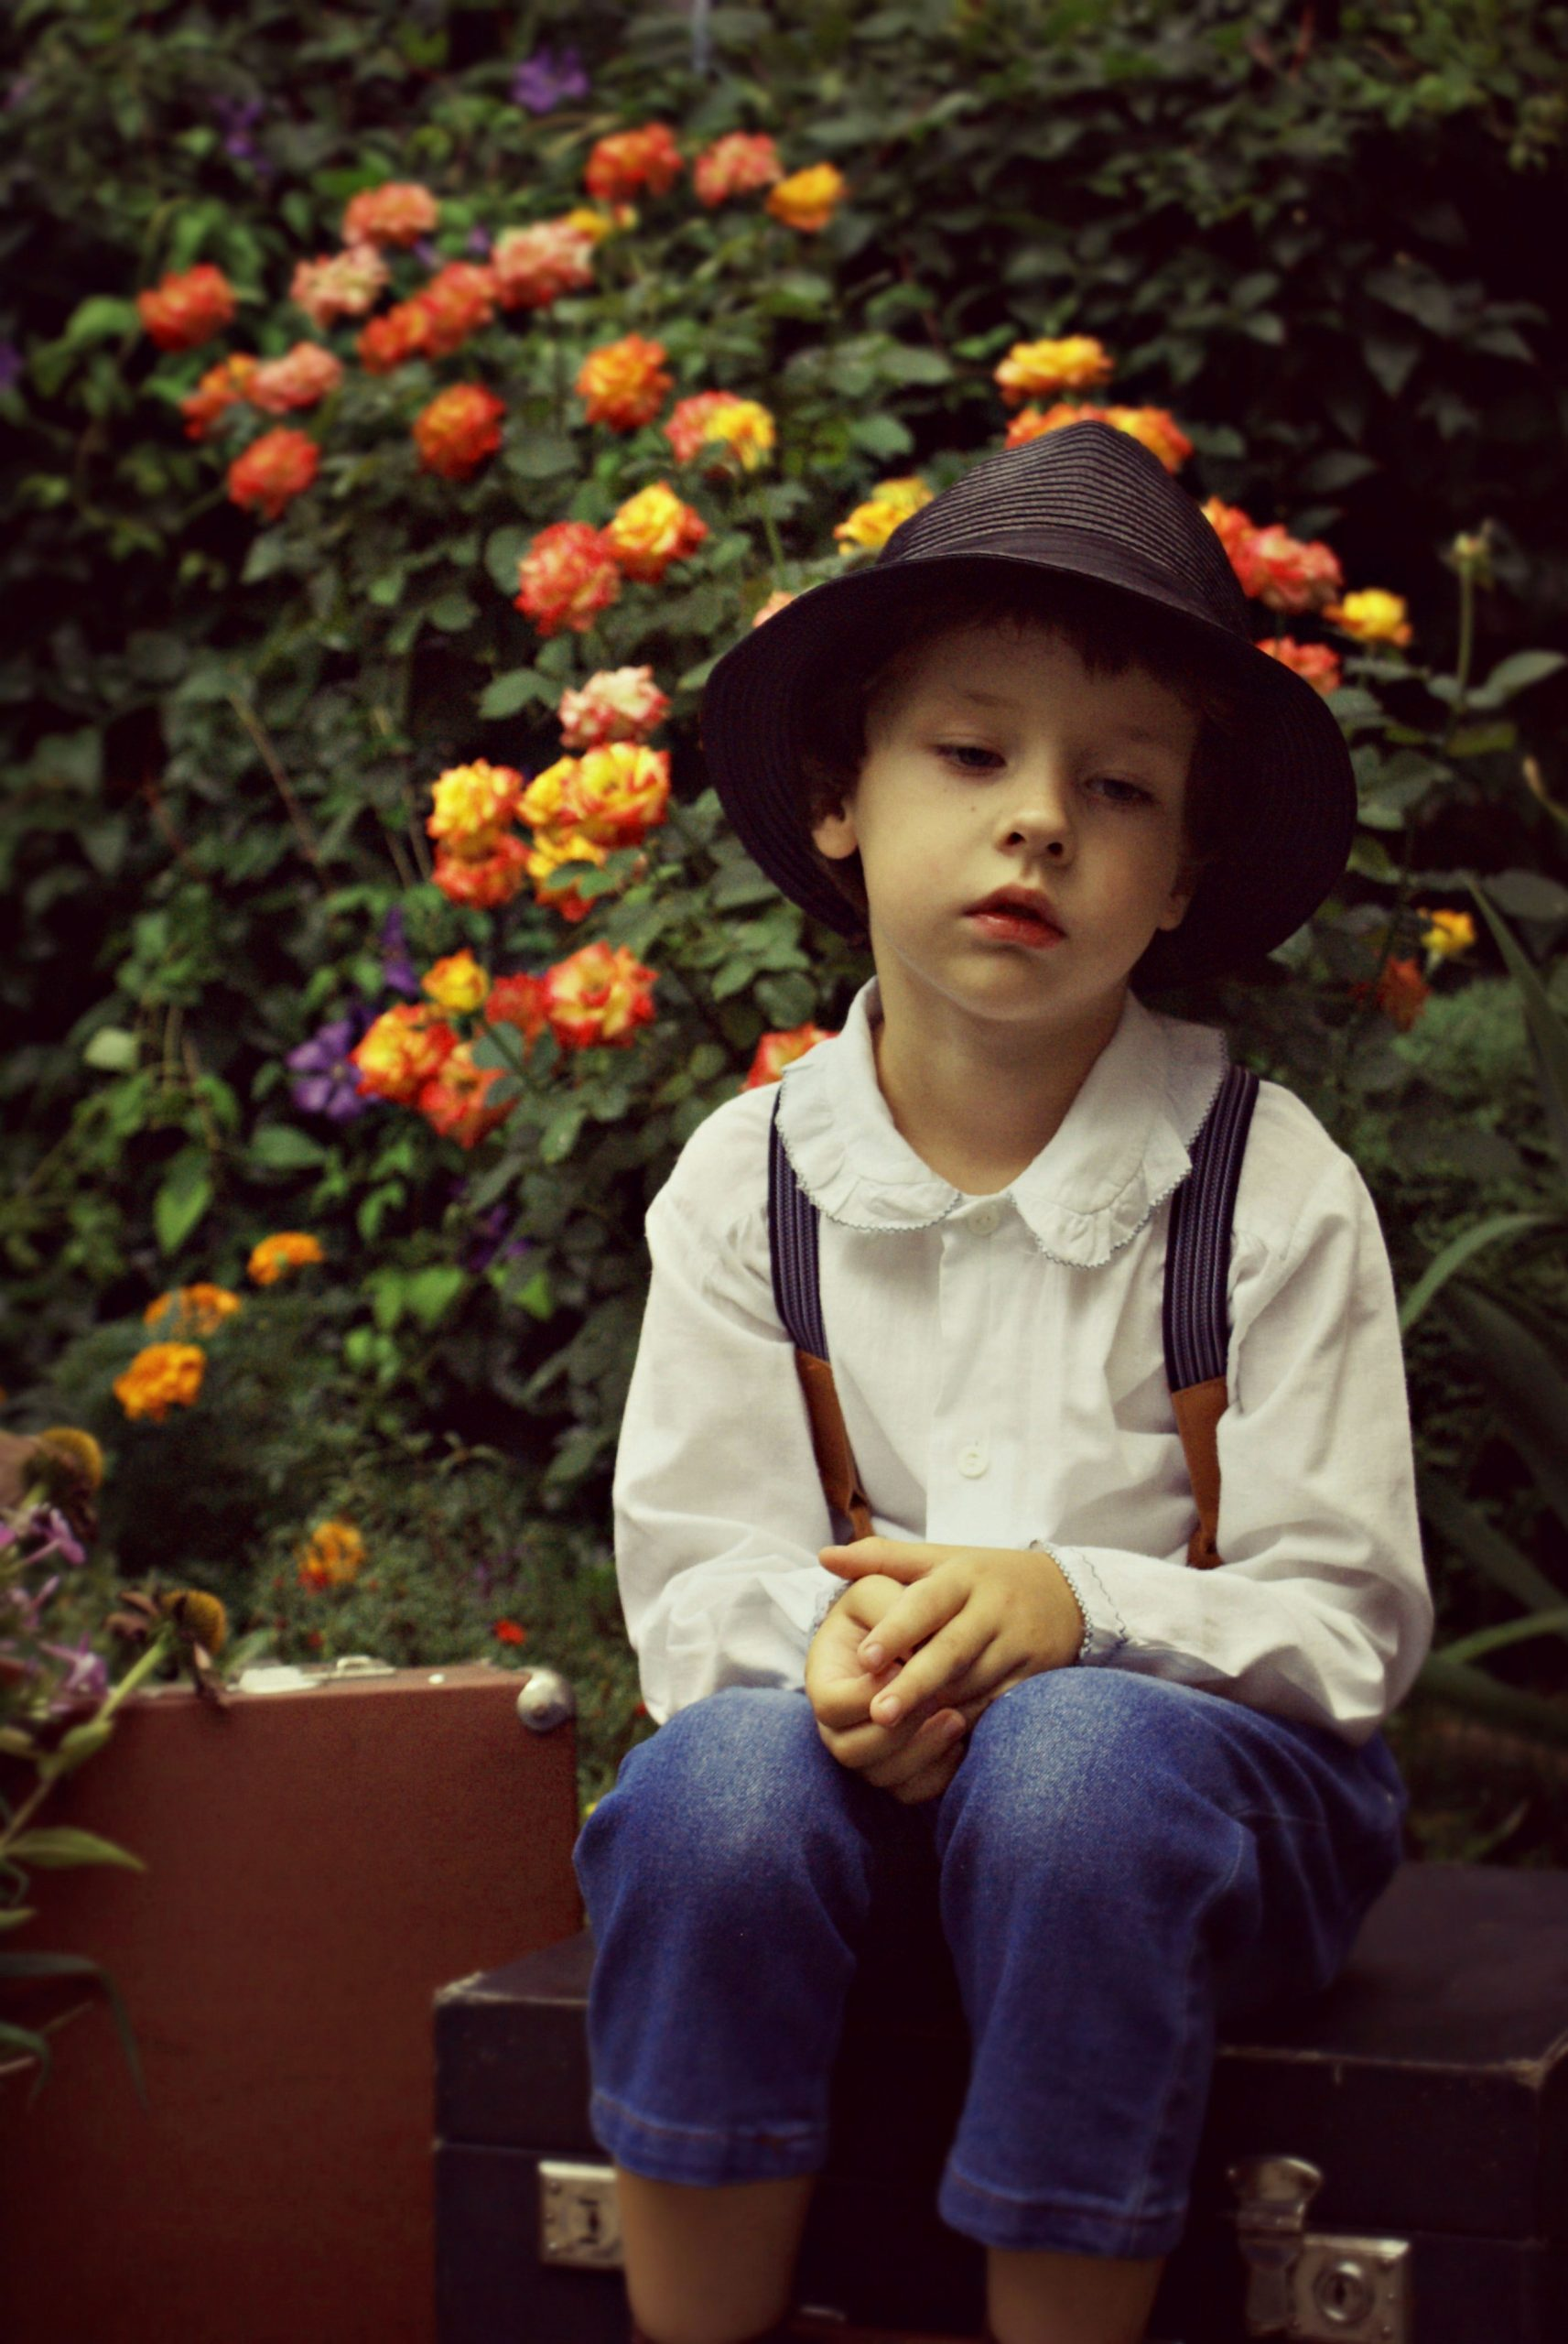 free Sad Boy Dp Images photo